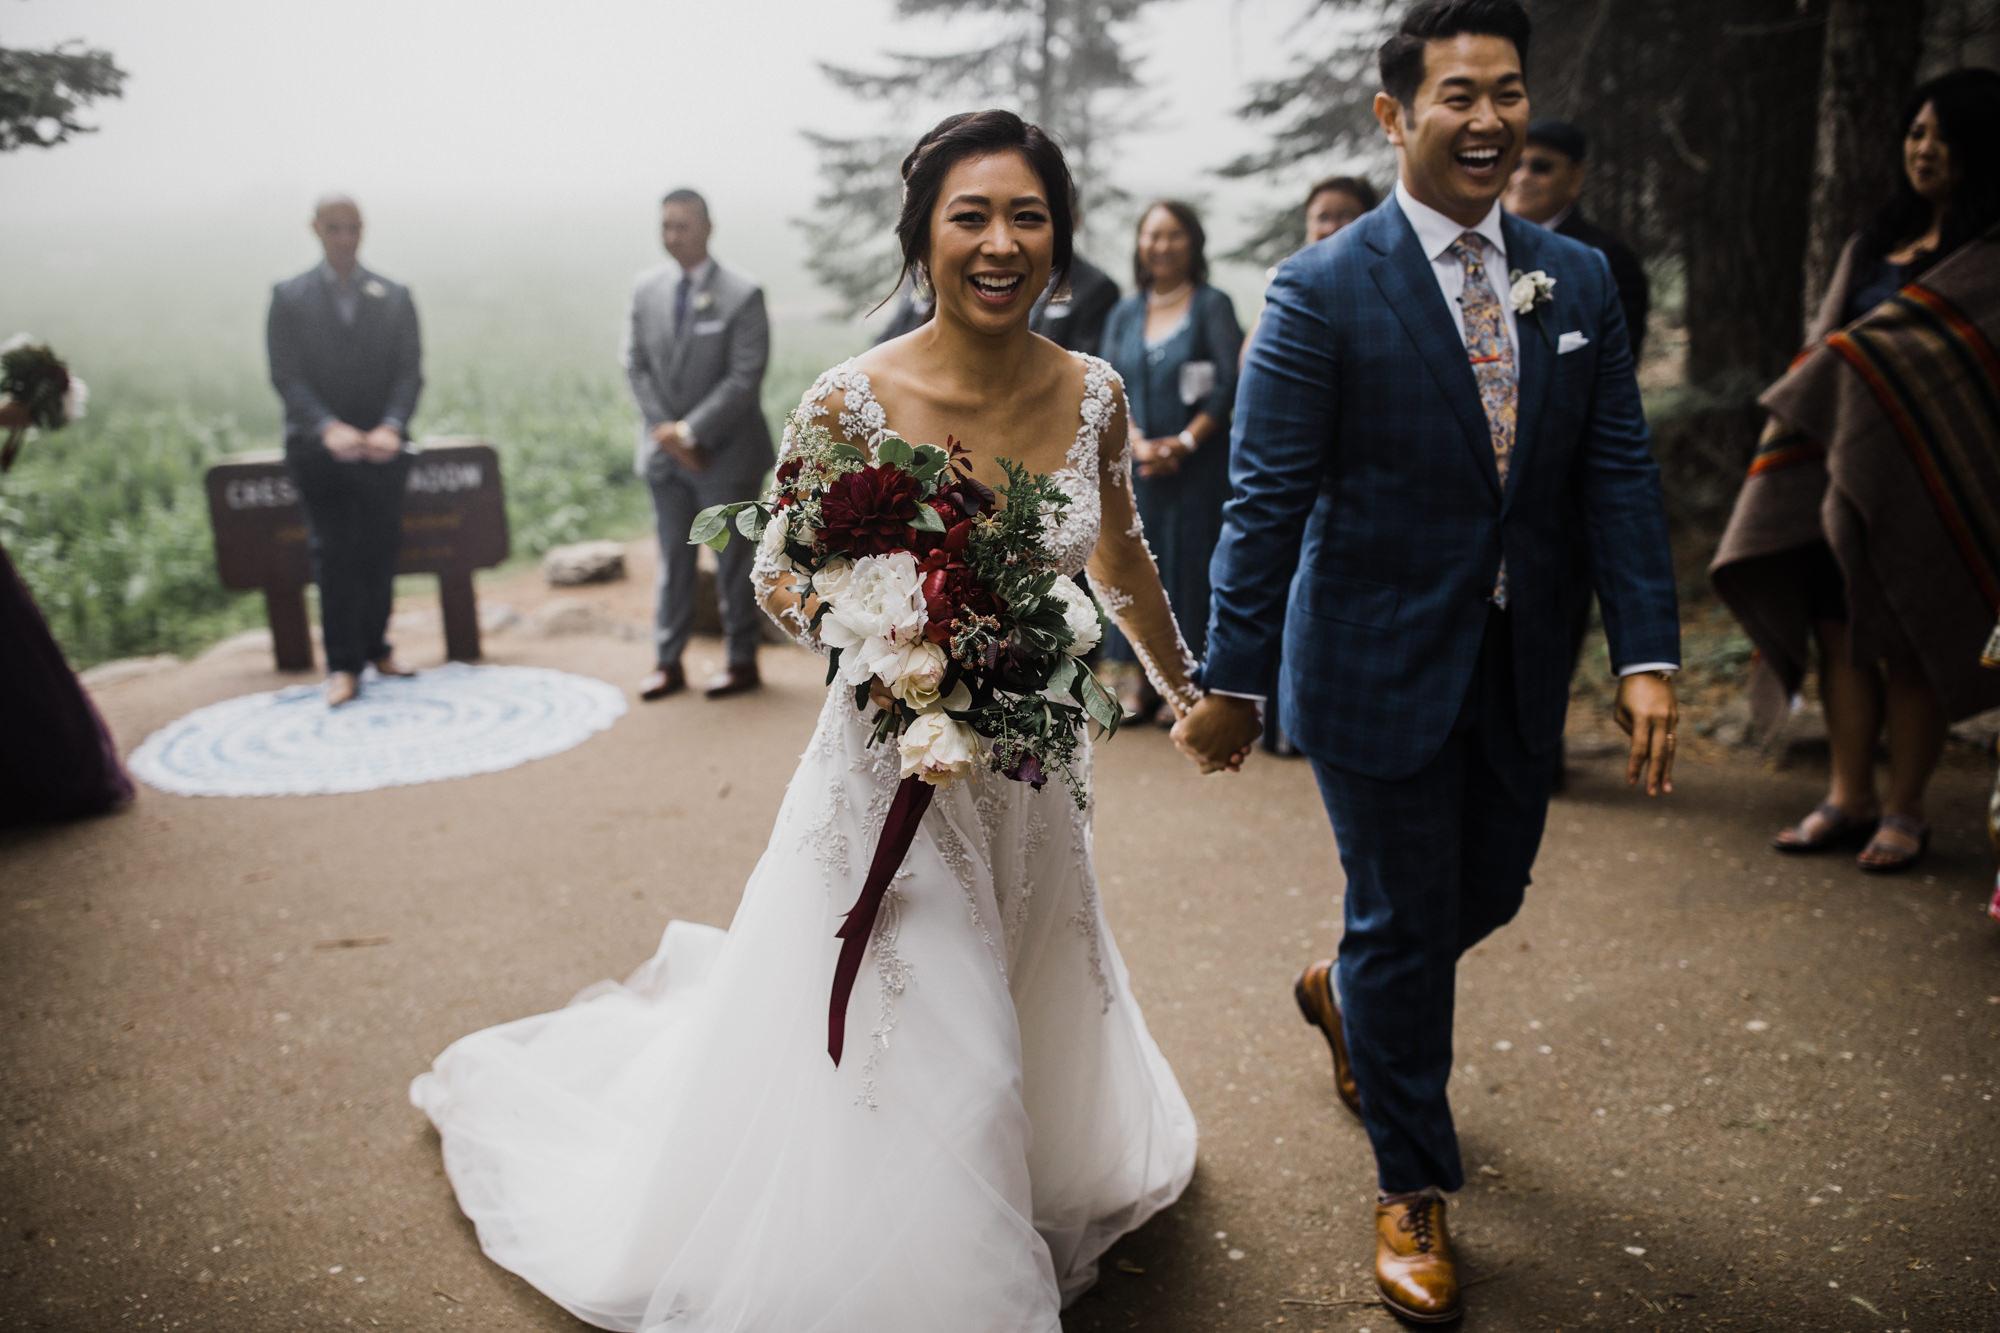 foggy intimate wedding in sequoia national park | destination adventure wedding photographers | the hearnes adventure photography | www.thehearnes.com